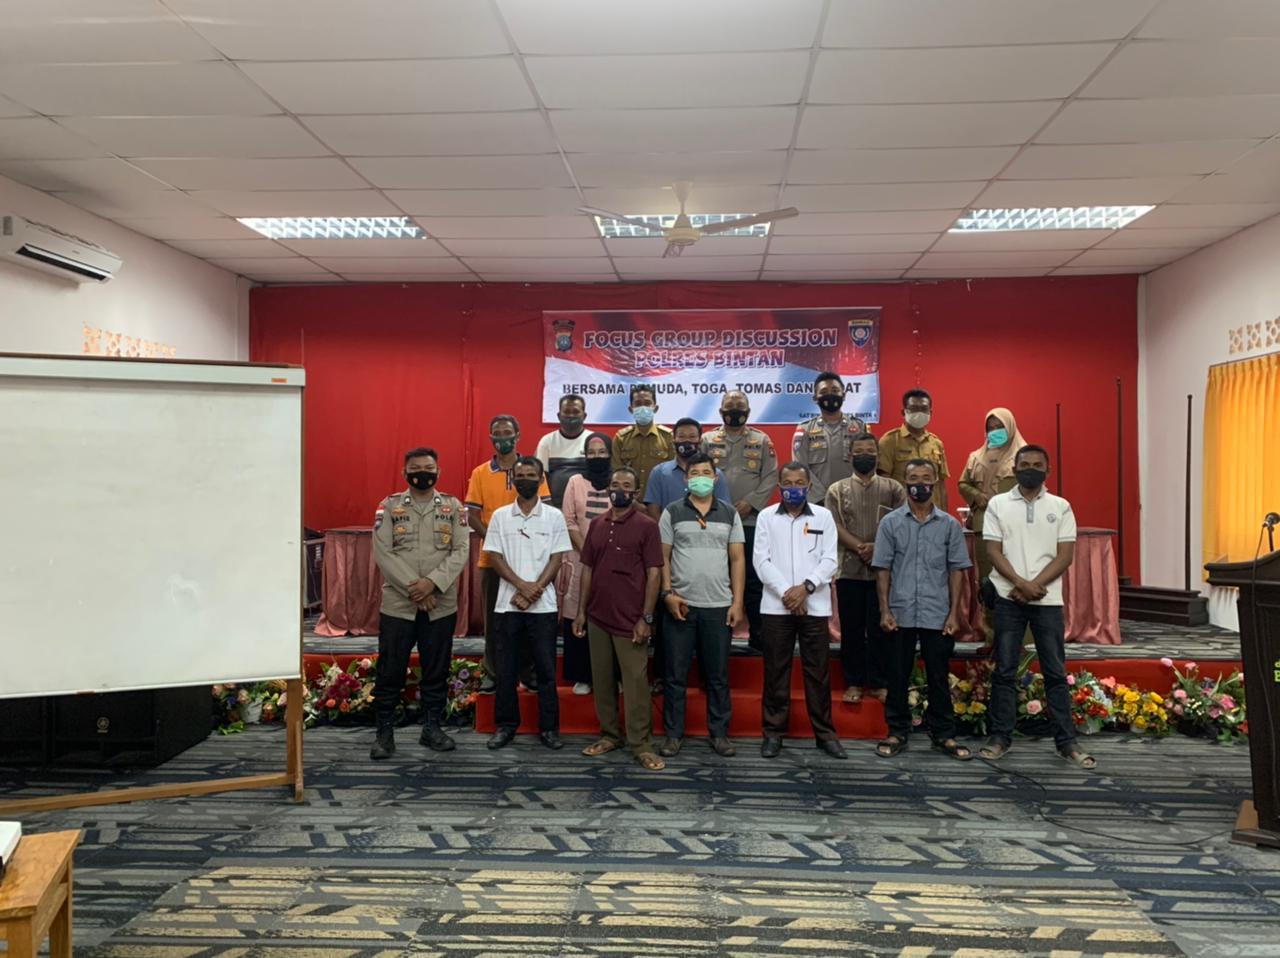 Satbinmas Polres Bintan Laksanakan FGD Bersama Toga, Tomas dan Todat Desa Penaga Untuk Menekan Penyebaran Covid-19